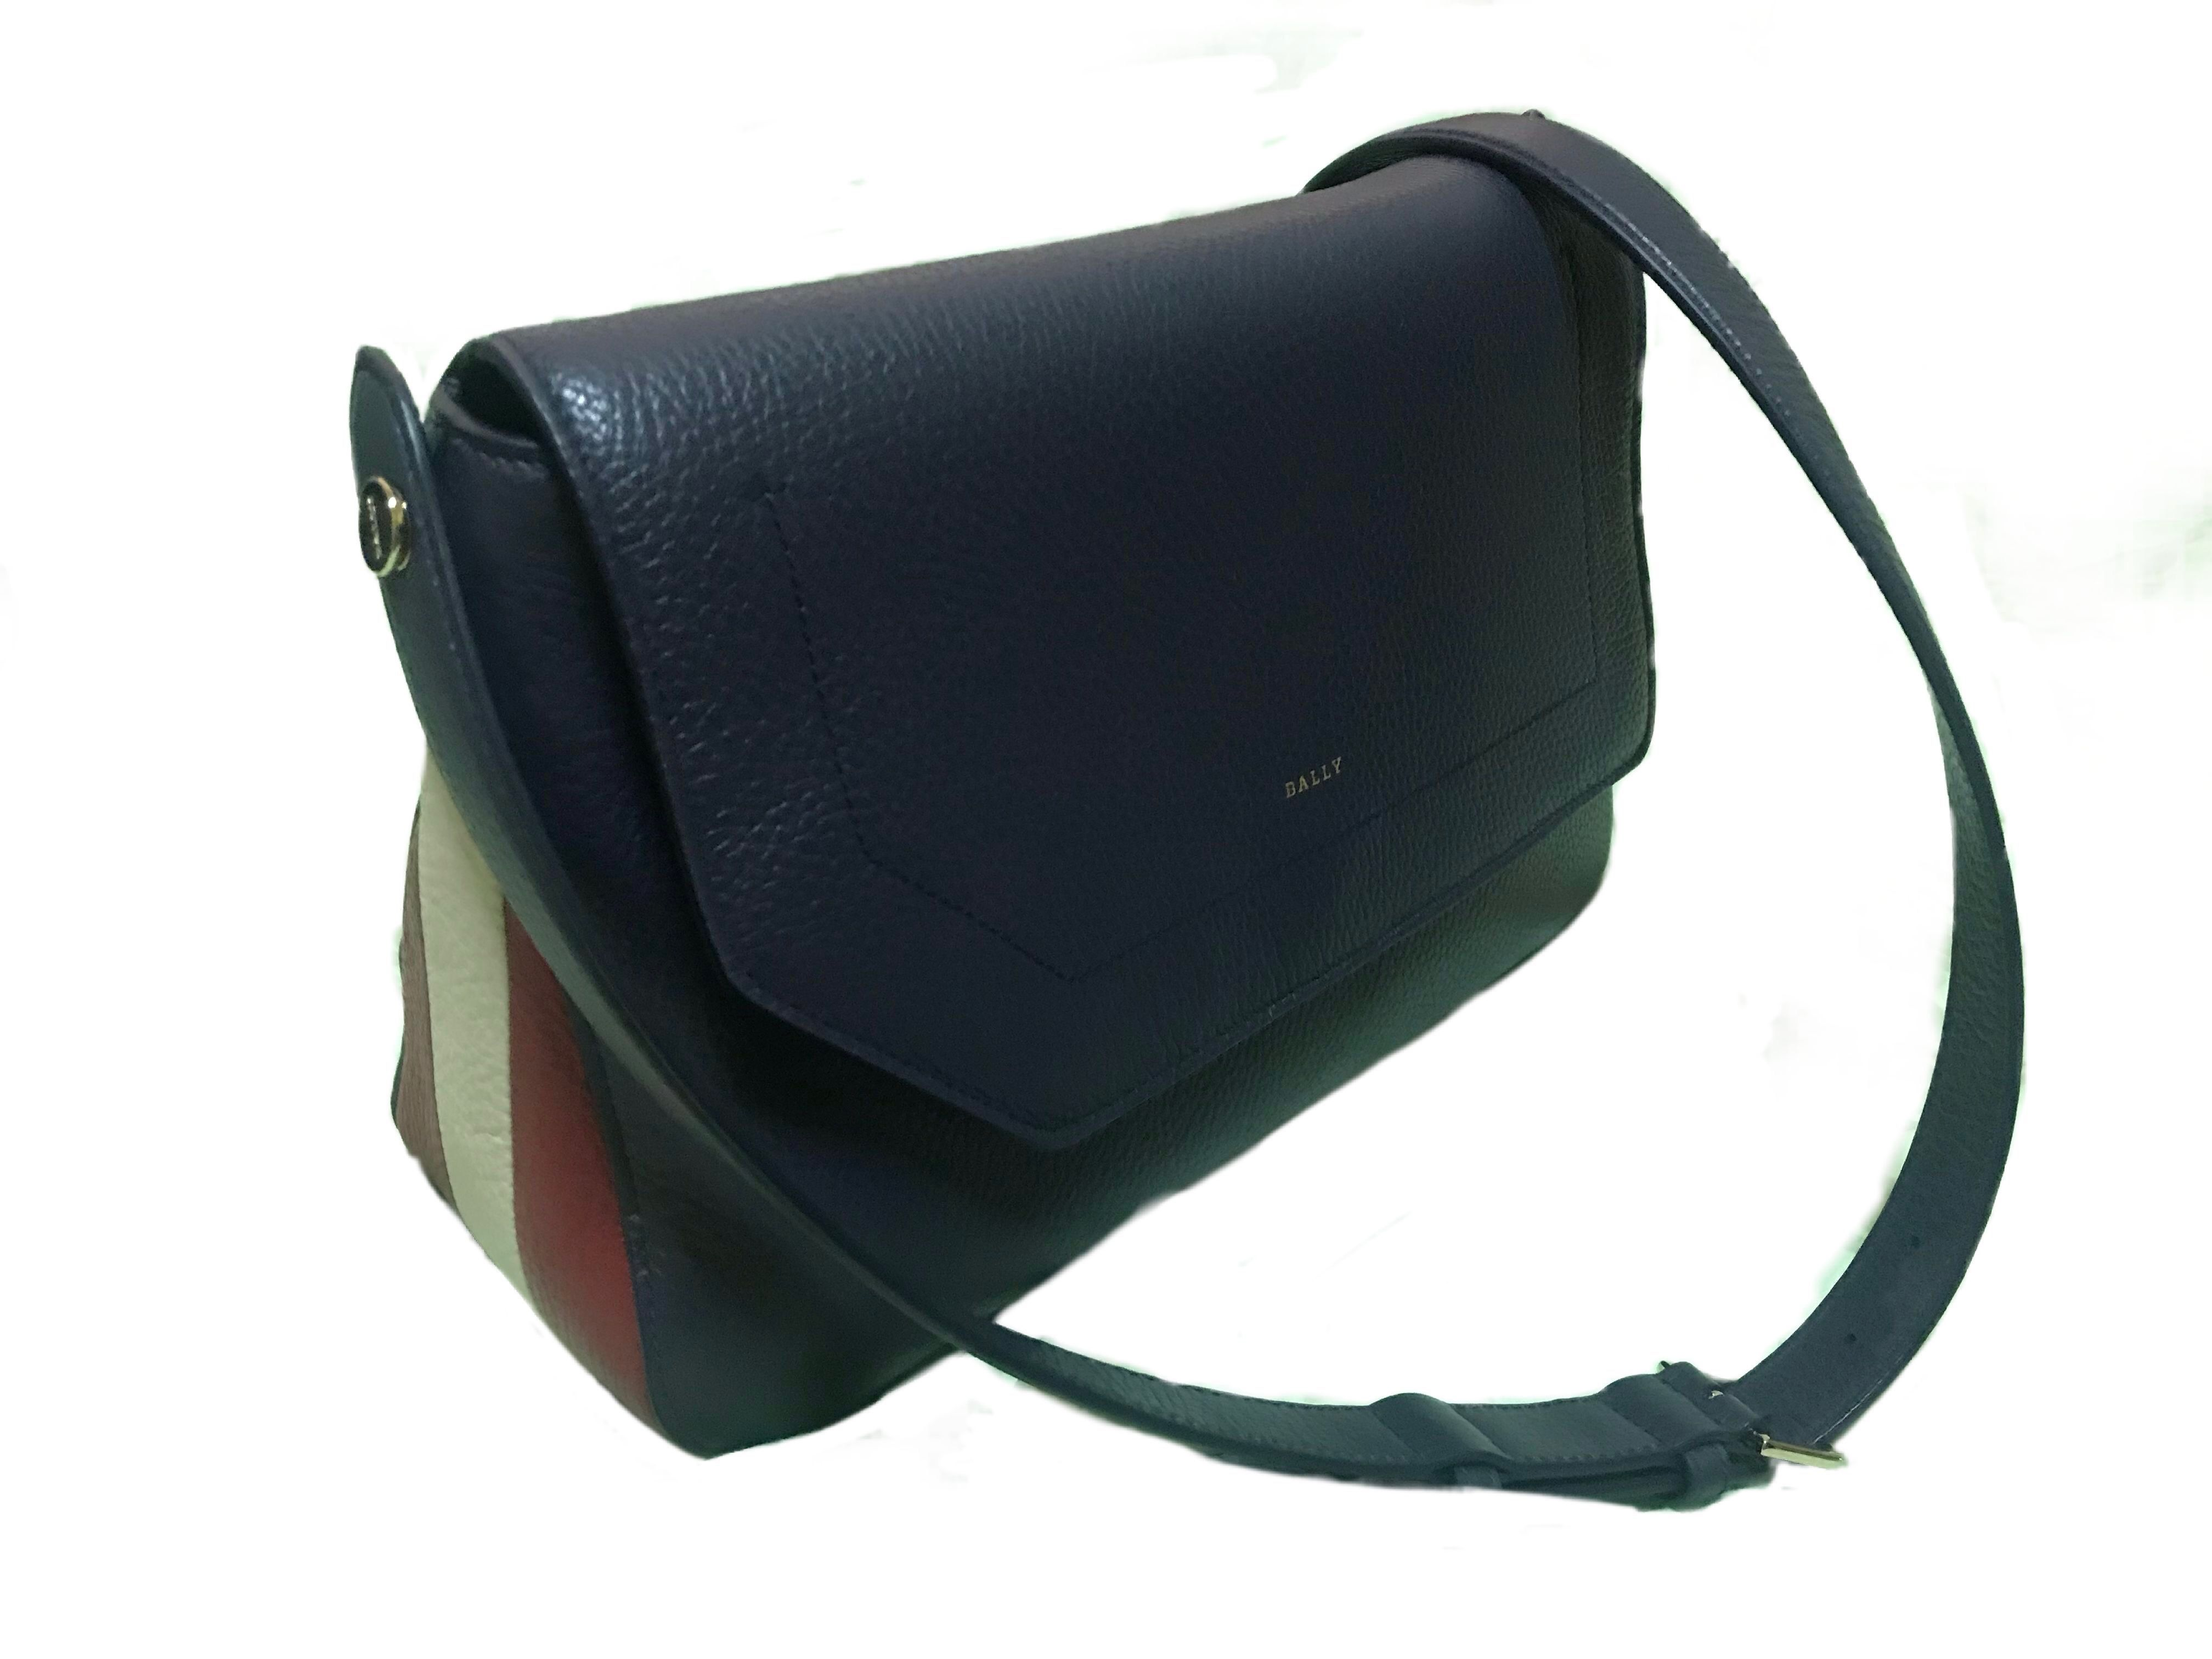 bd75aac90 Bally ❤ Bezin Cross-body bag in Marine   Arm Candy   Crossbody ...